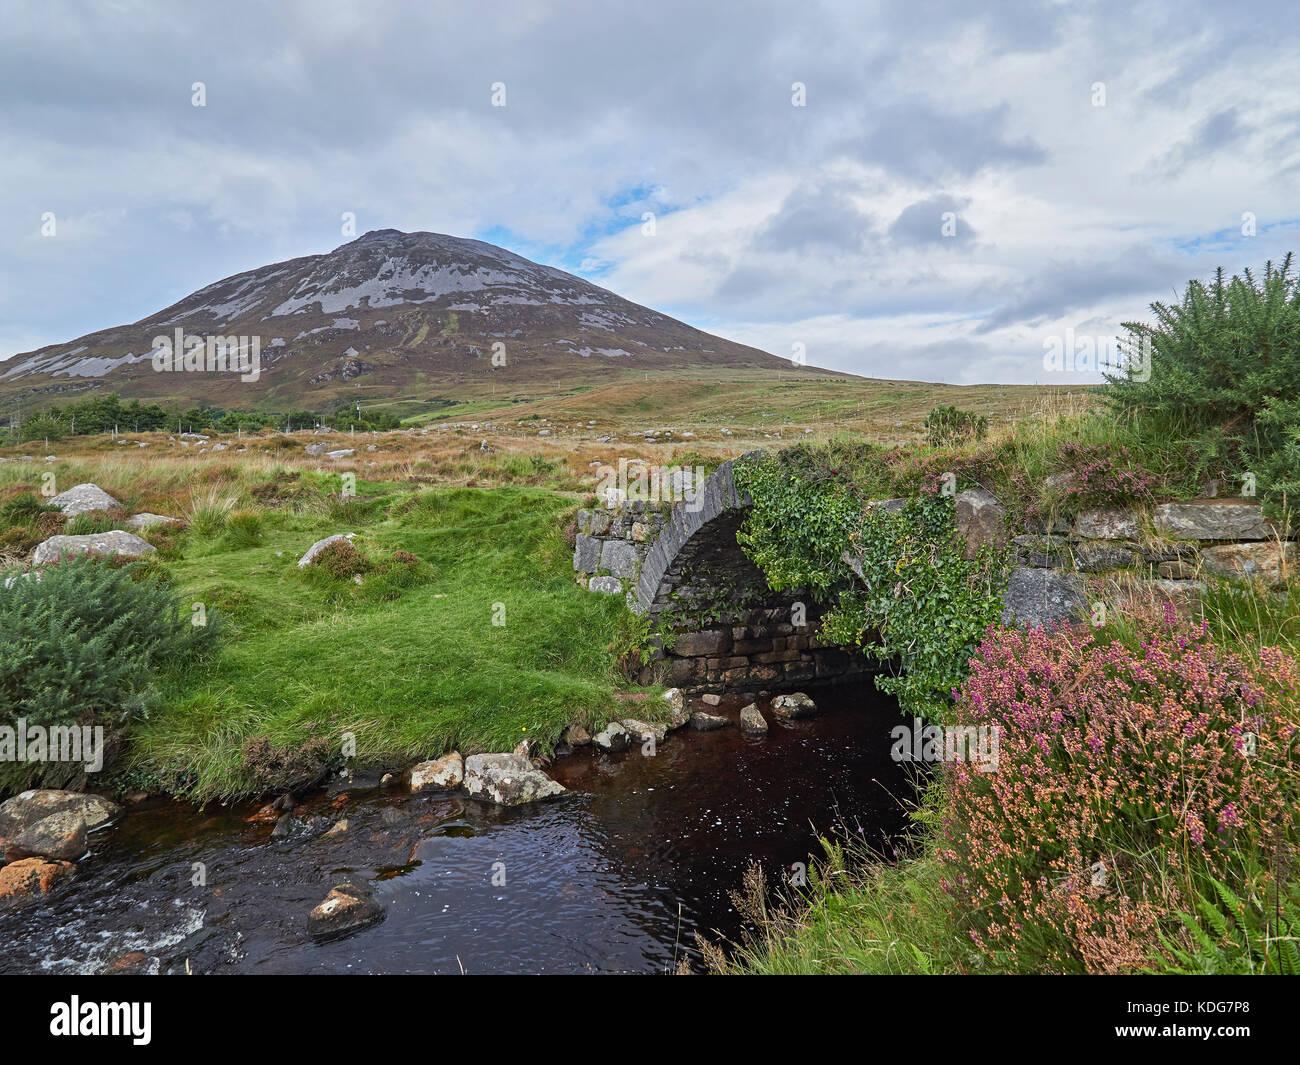 Poisened Glen looking towards Mount Errigal Letterkenny County Donegal Ireland - Stock Image